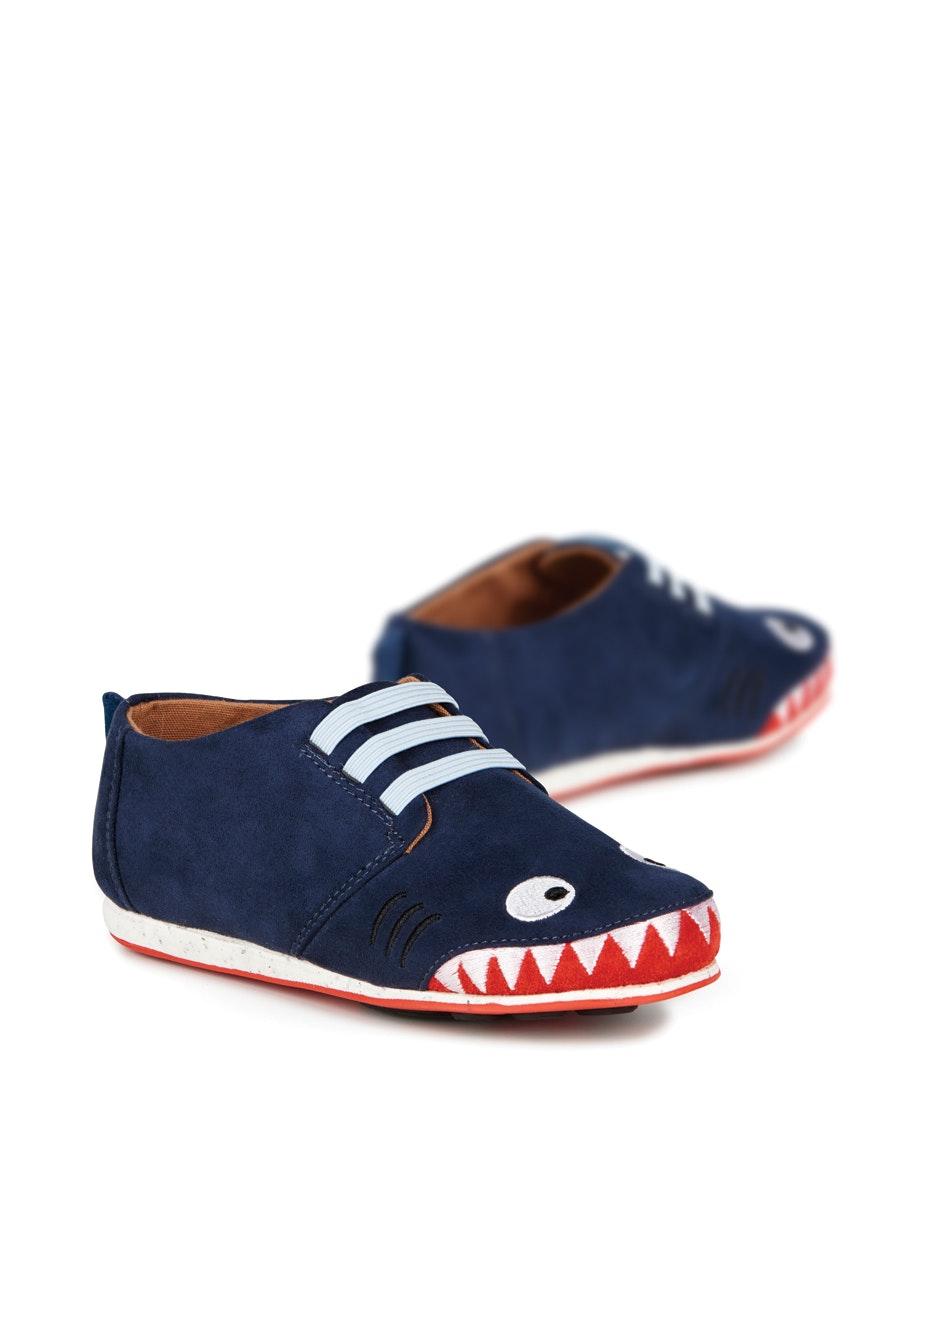 Emu - Shark Sneaker - Navy